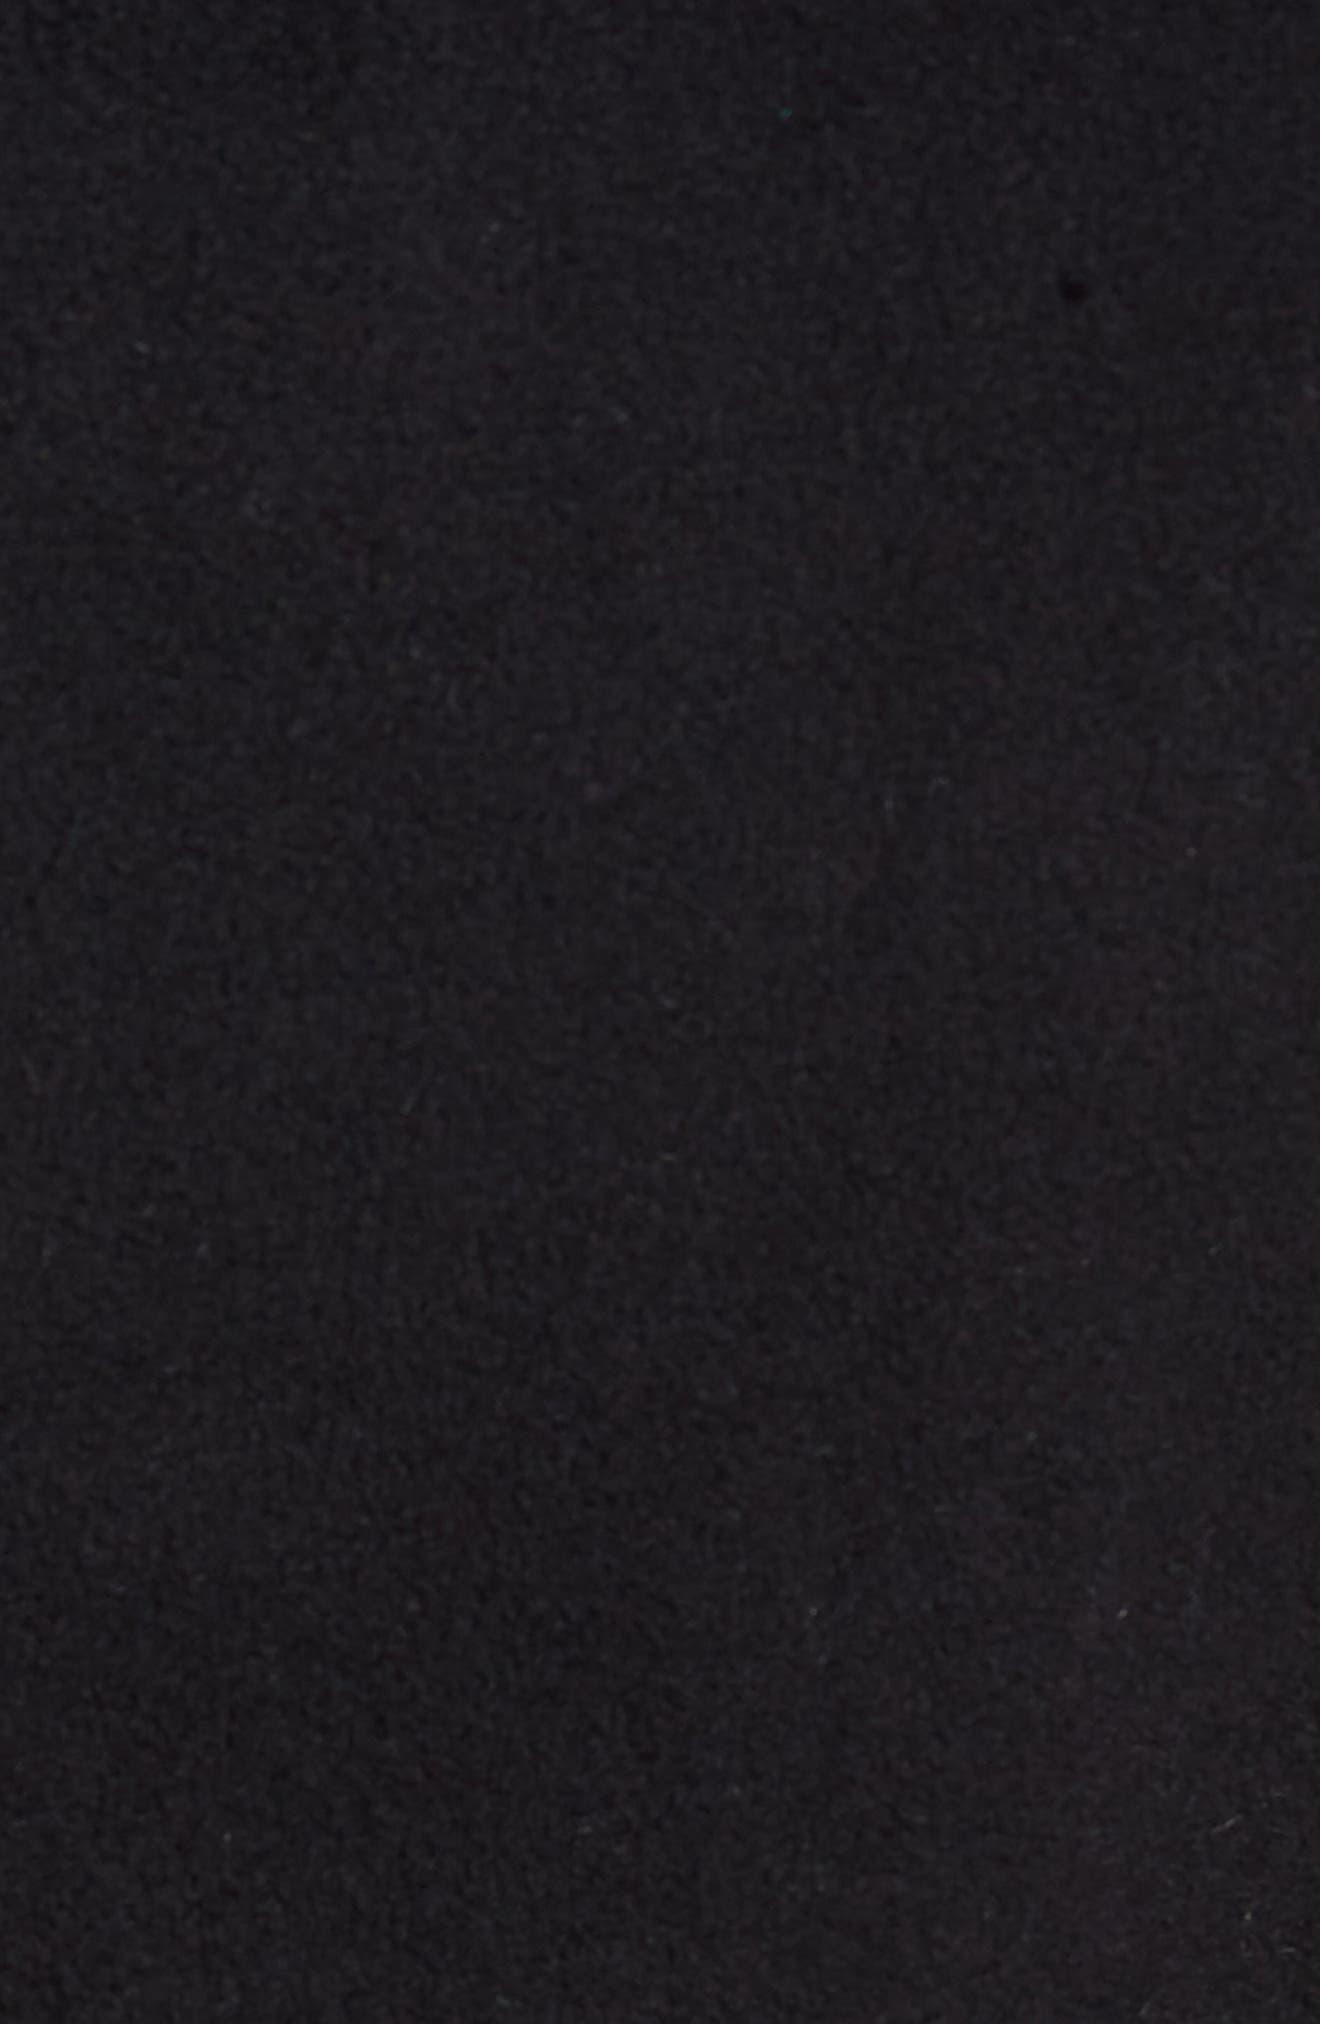 Bonded Fleece Zip Front Vest,                             Alternate thumbnail 6, color,                             001